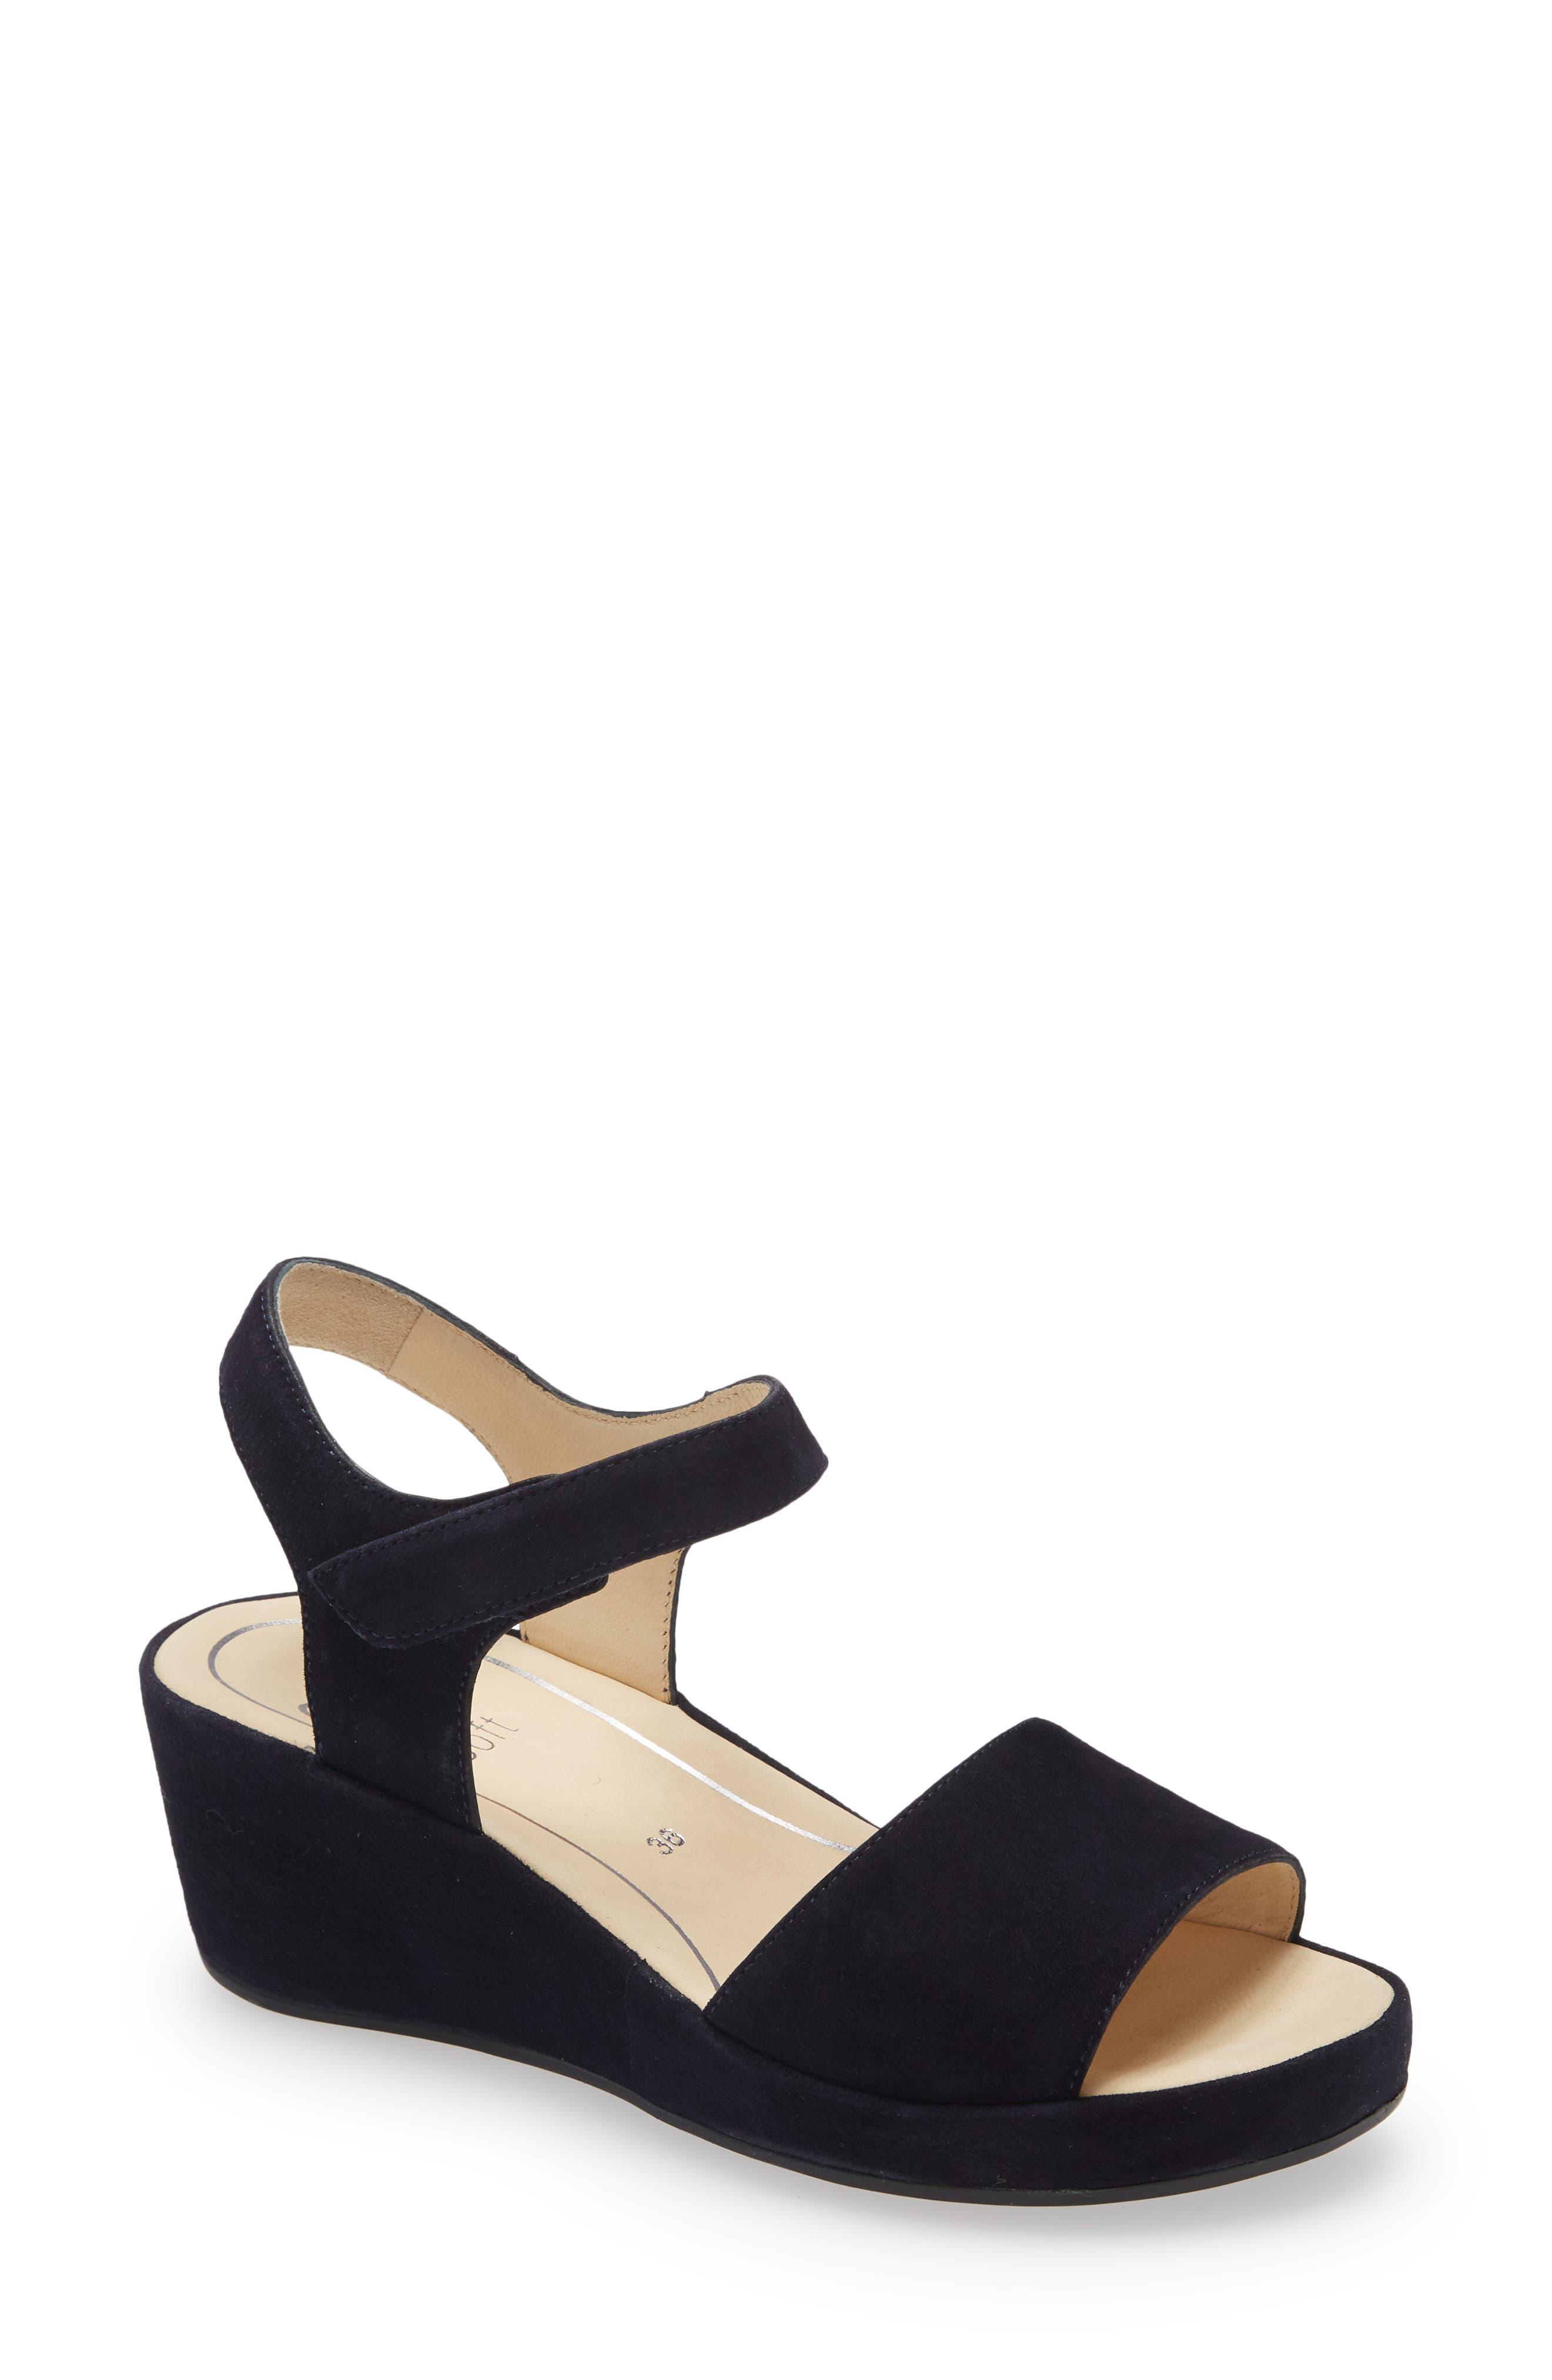 Rouge Wedge Sandal